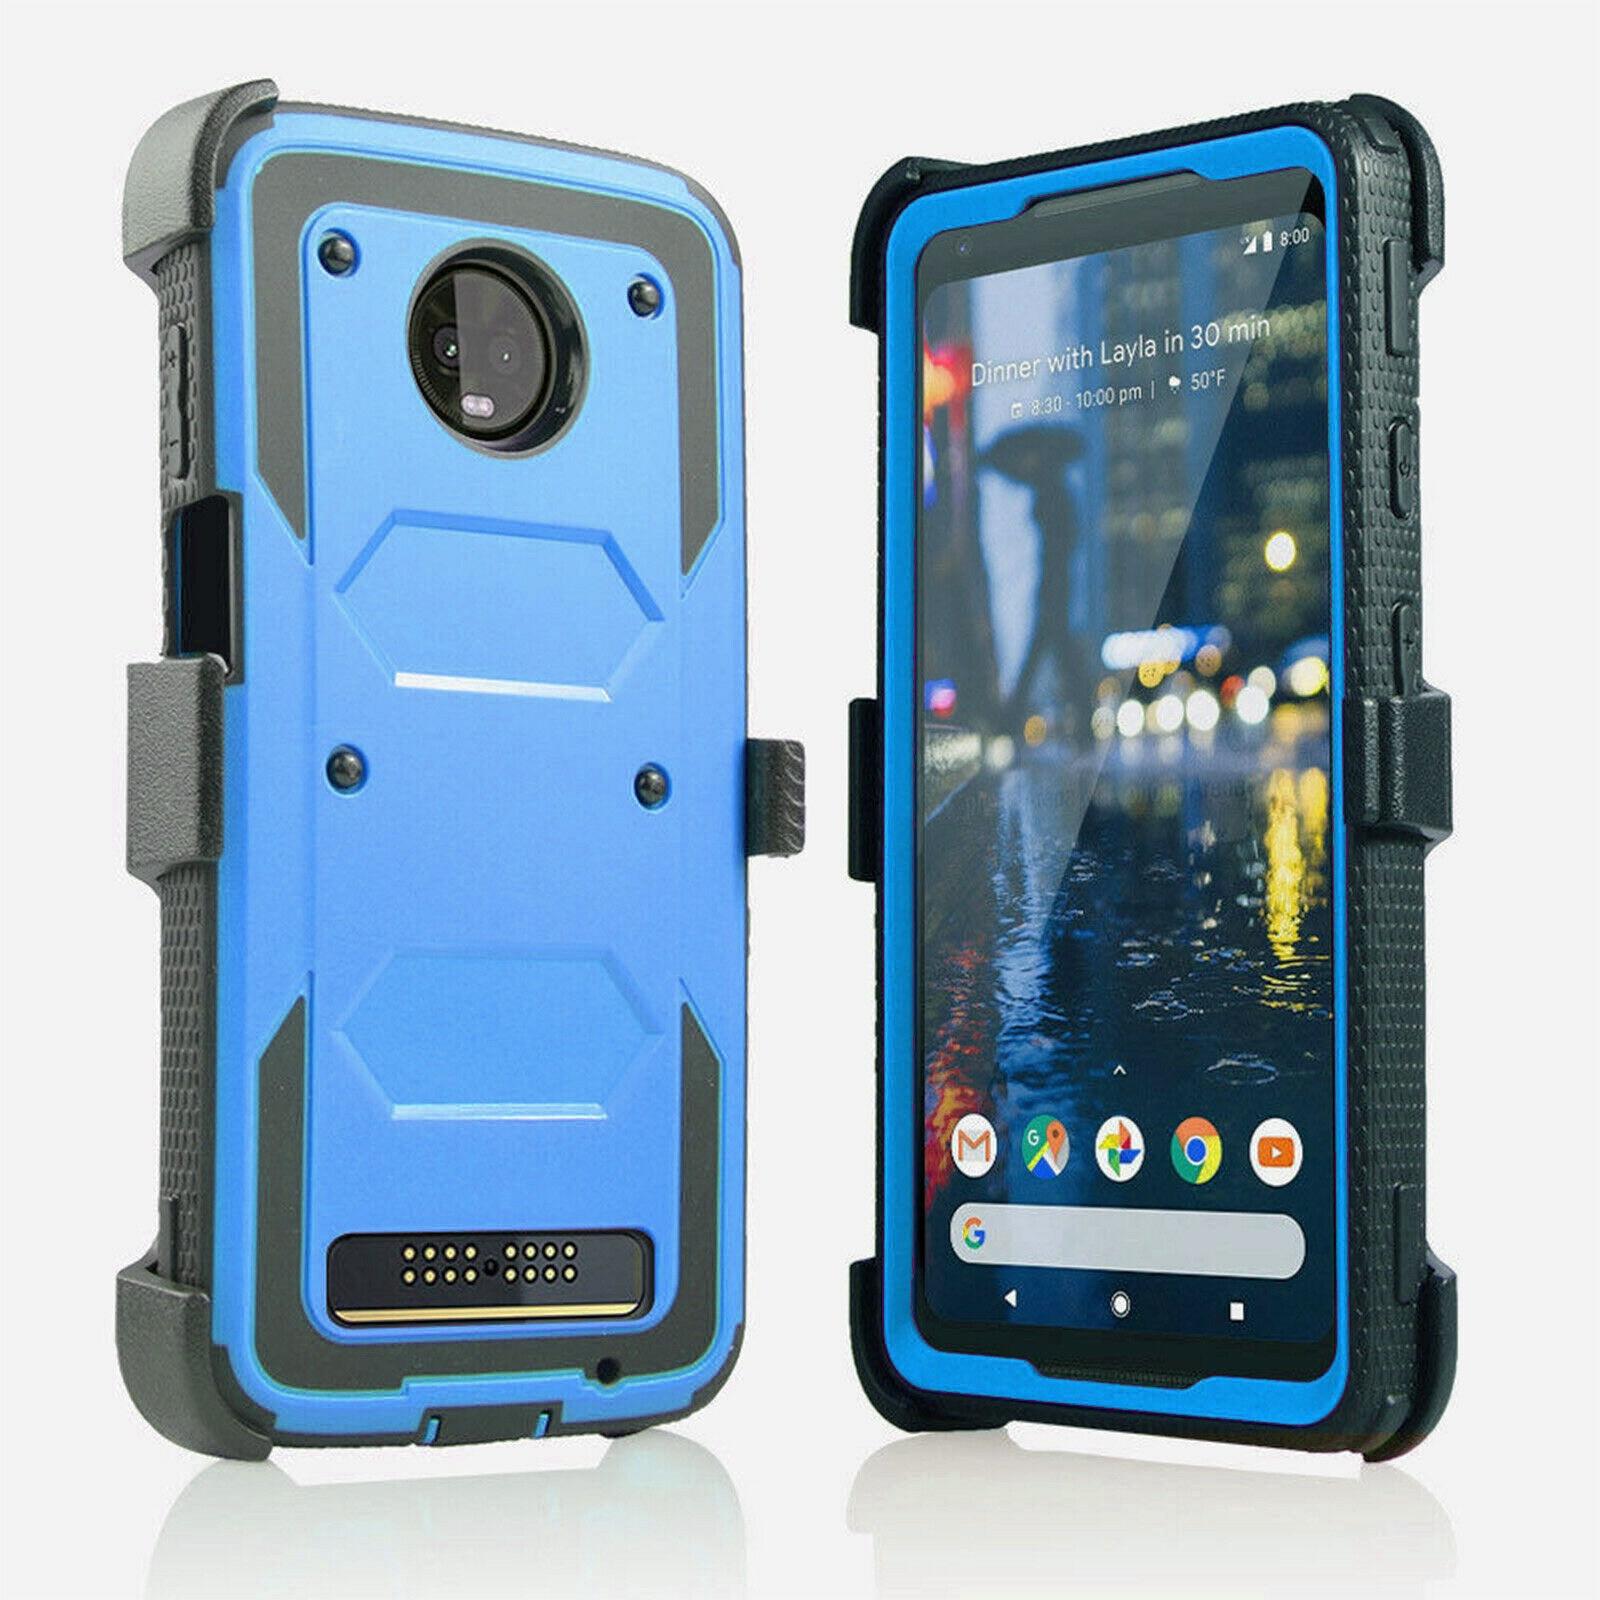 For Motorola Moto Z4 Play Heavy Duty Hybrid Armor Case Shockproof Impact Protective Belt Clip Holster Kickstand Cover Moto